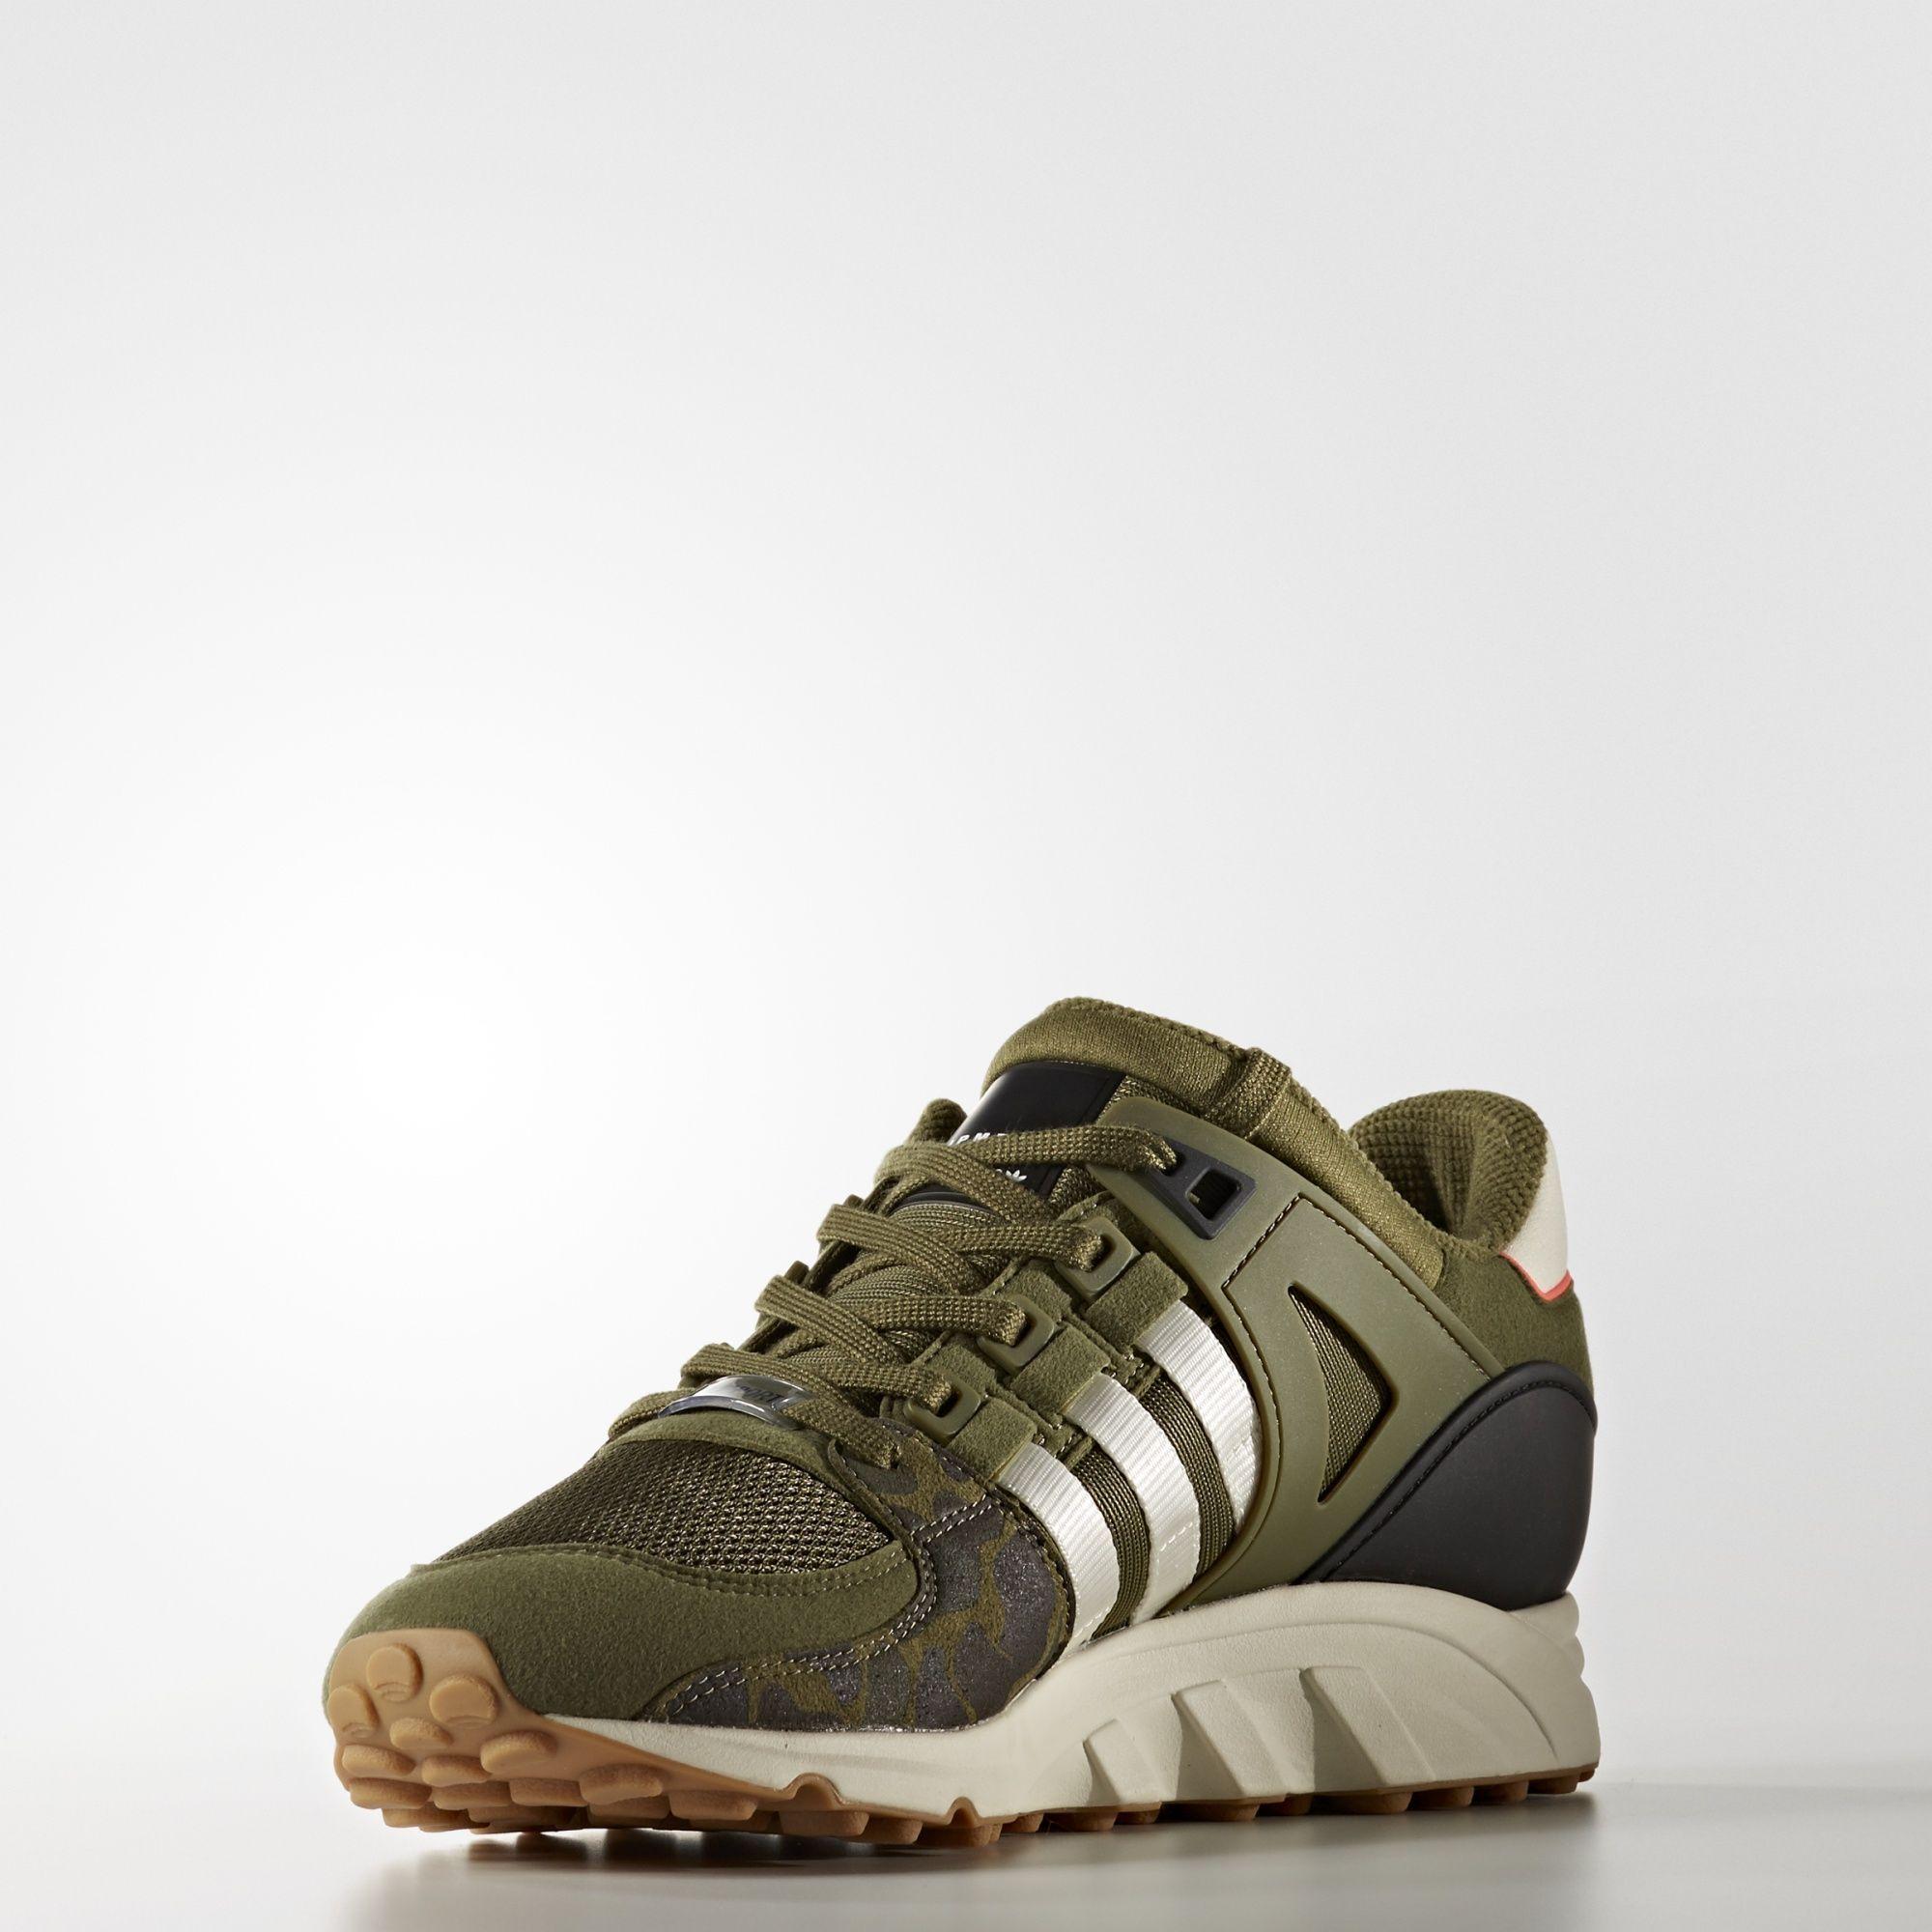 finest selection 2b7c0 e9a4e adidas - Кроссовки EQT Support RF Black Adidas, Camo, Adidas Shoes, Street  Wear